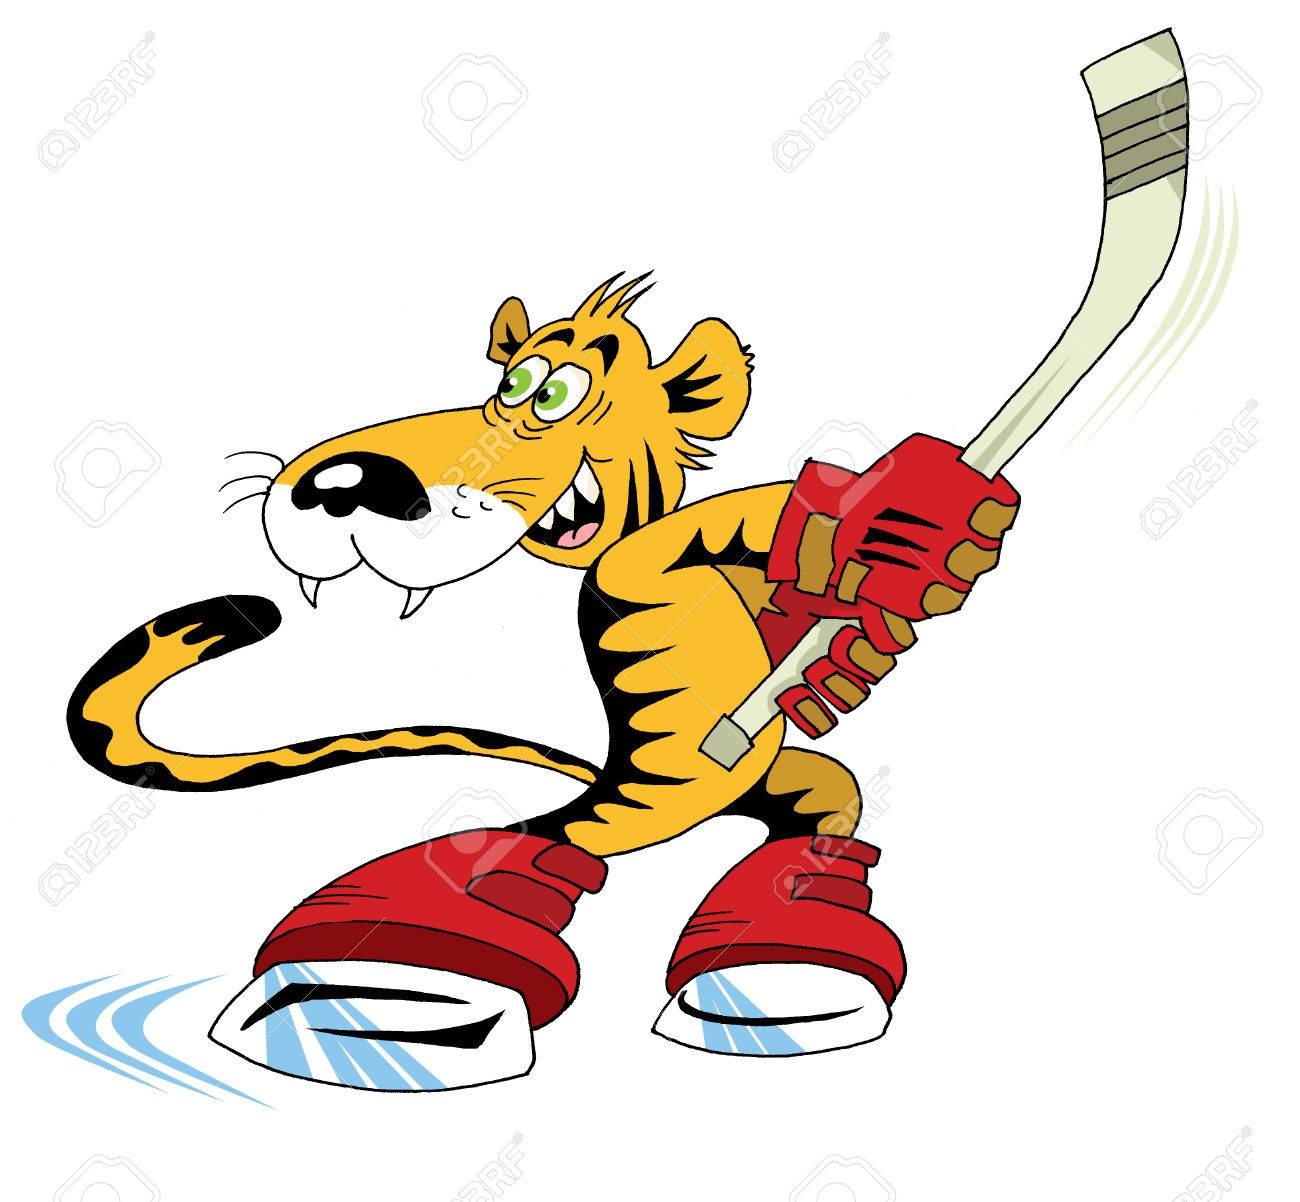 tiger cub playing hockey Stock Vector - 6132010